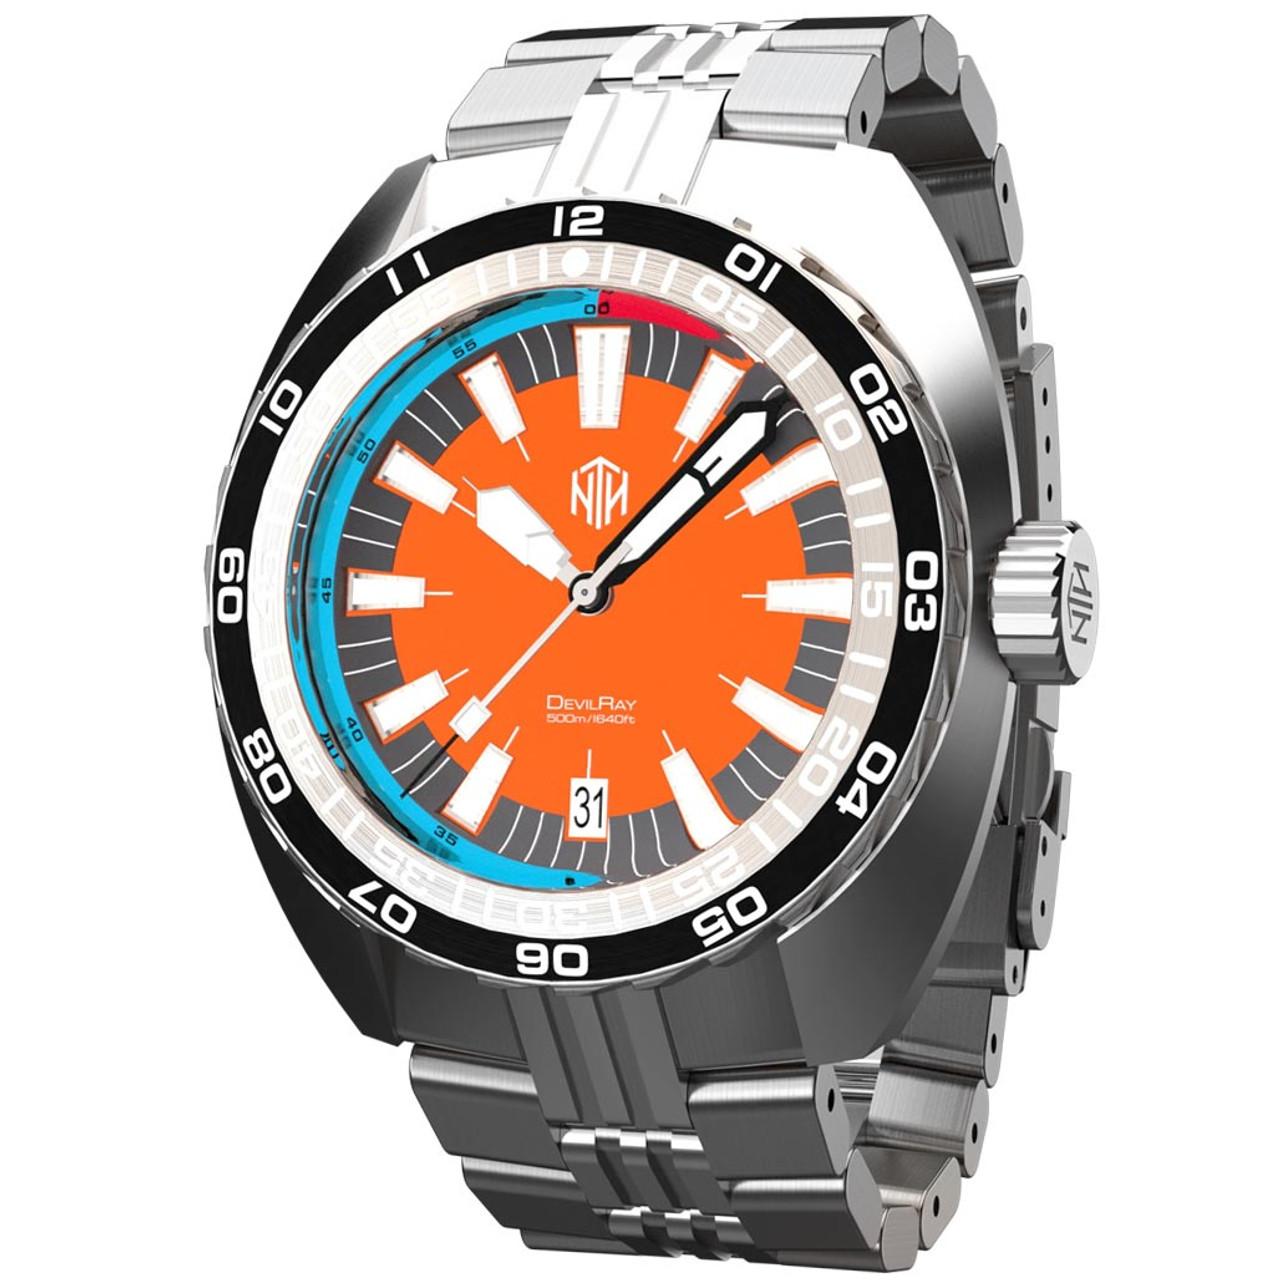 nth-mens-dive-watch-ww-nth-drod-1__45200.1630822965.jpg